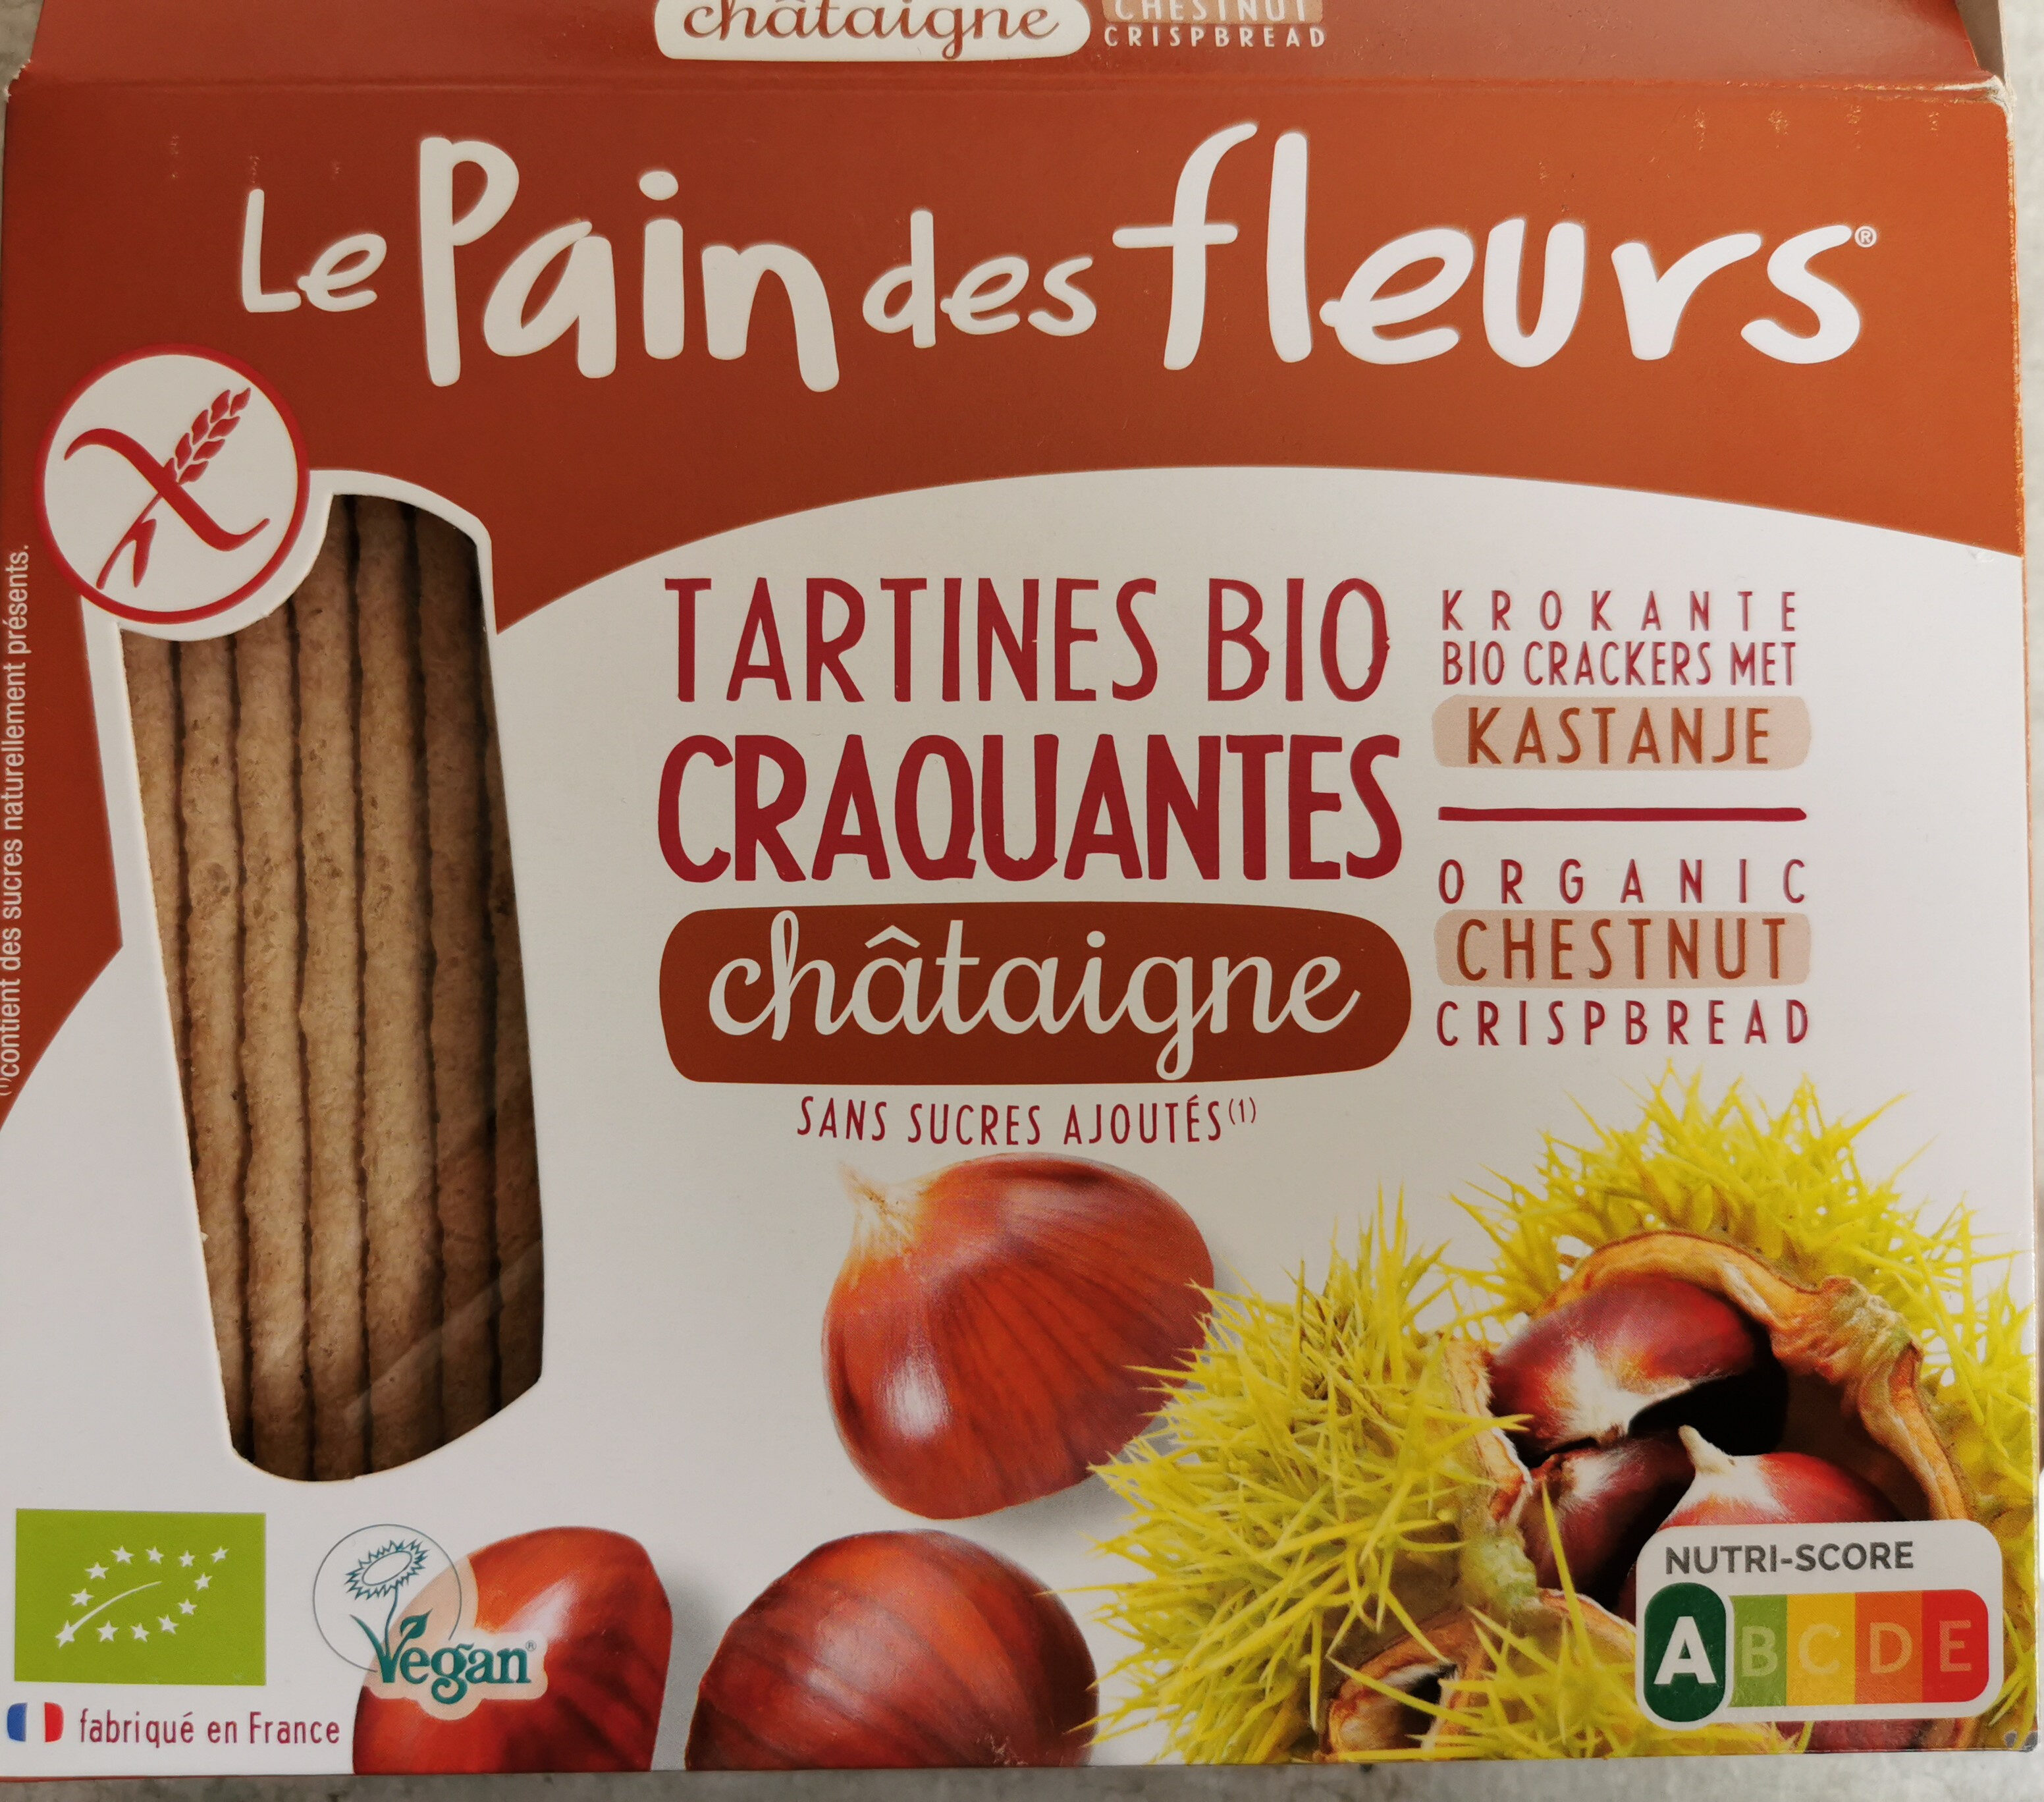 Tartines Bio Craquantes Châtaigne - Produit - fr